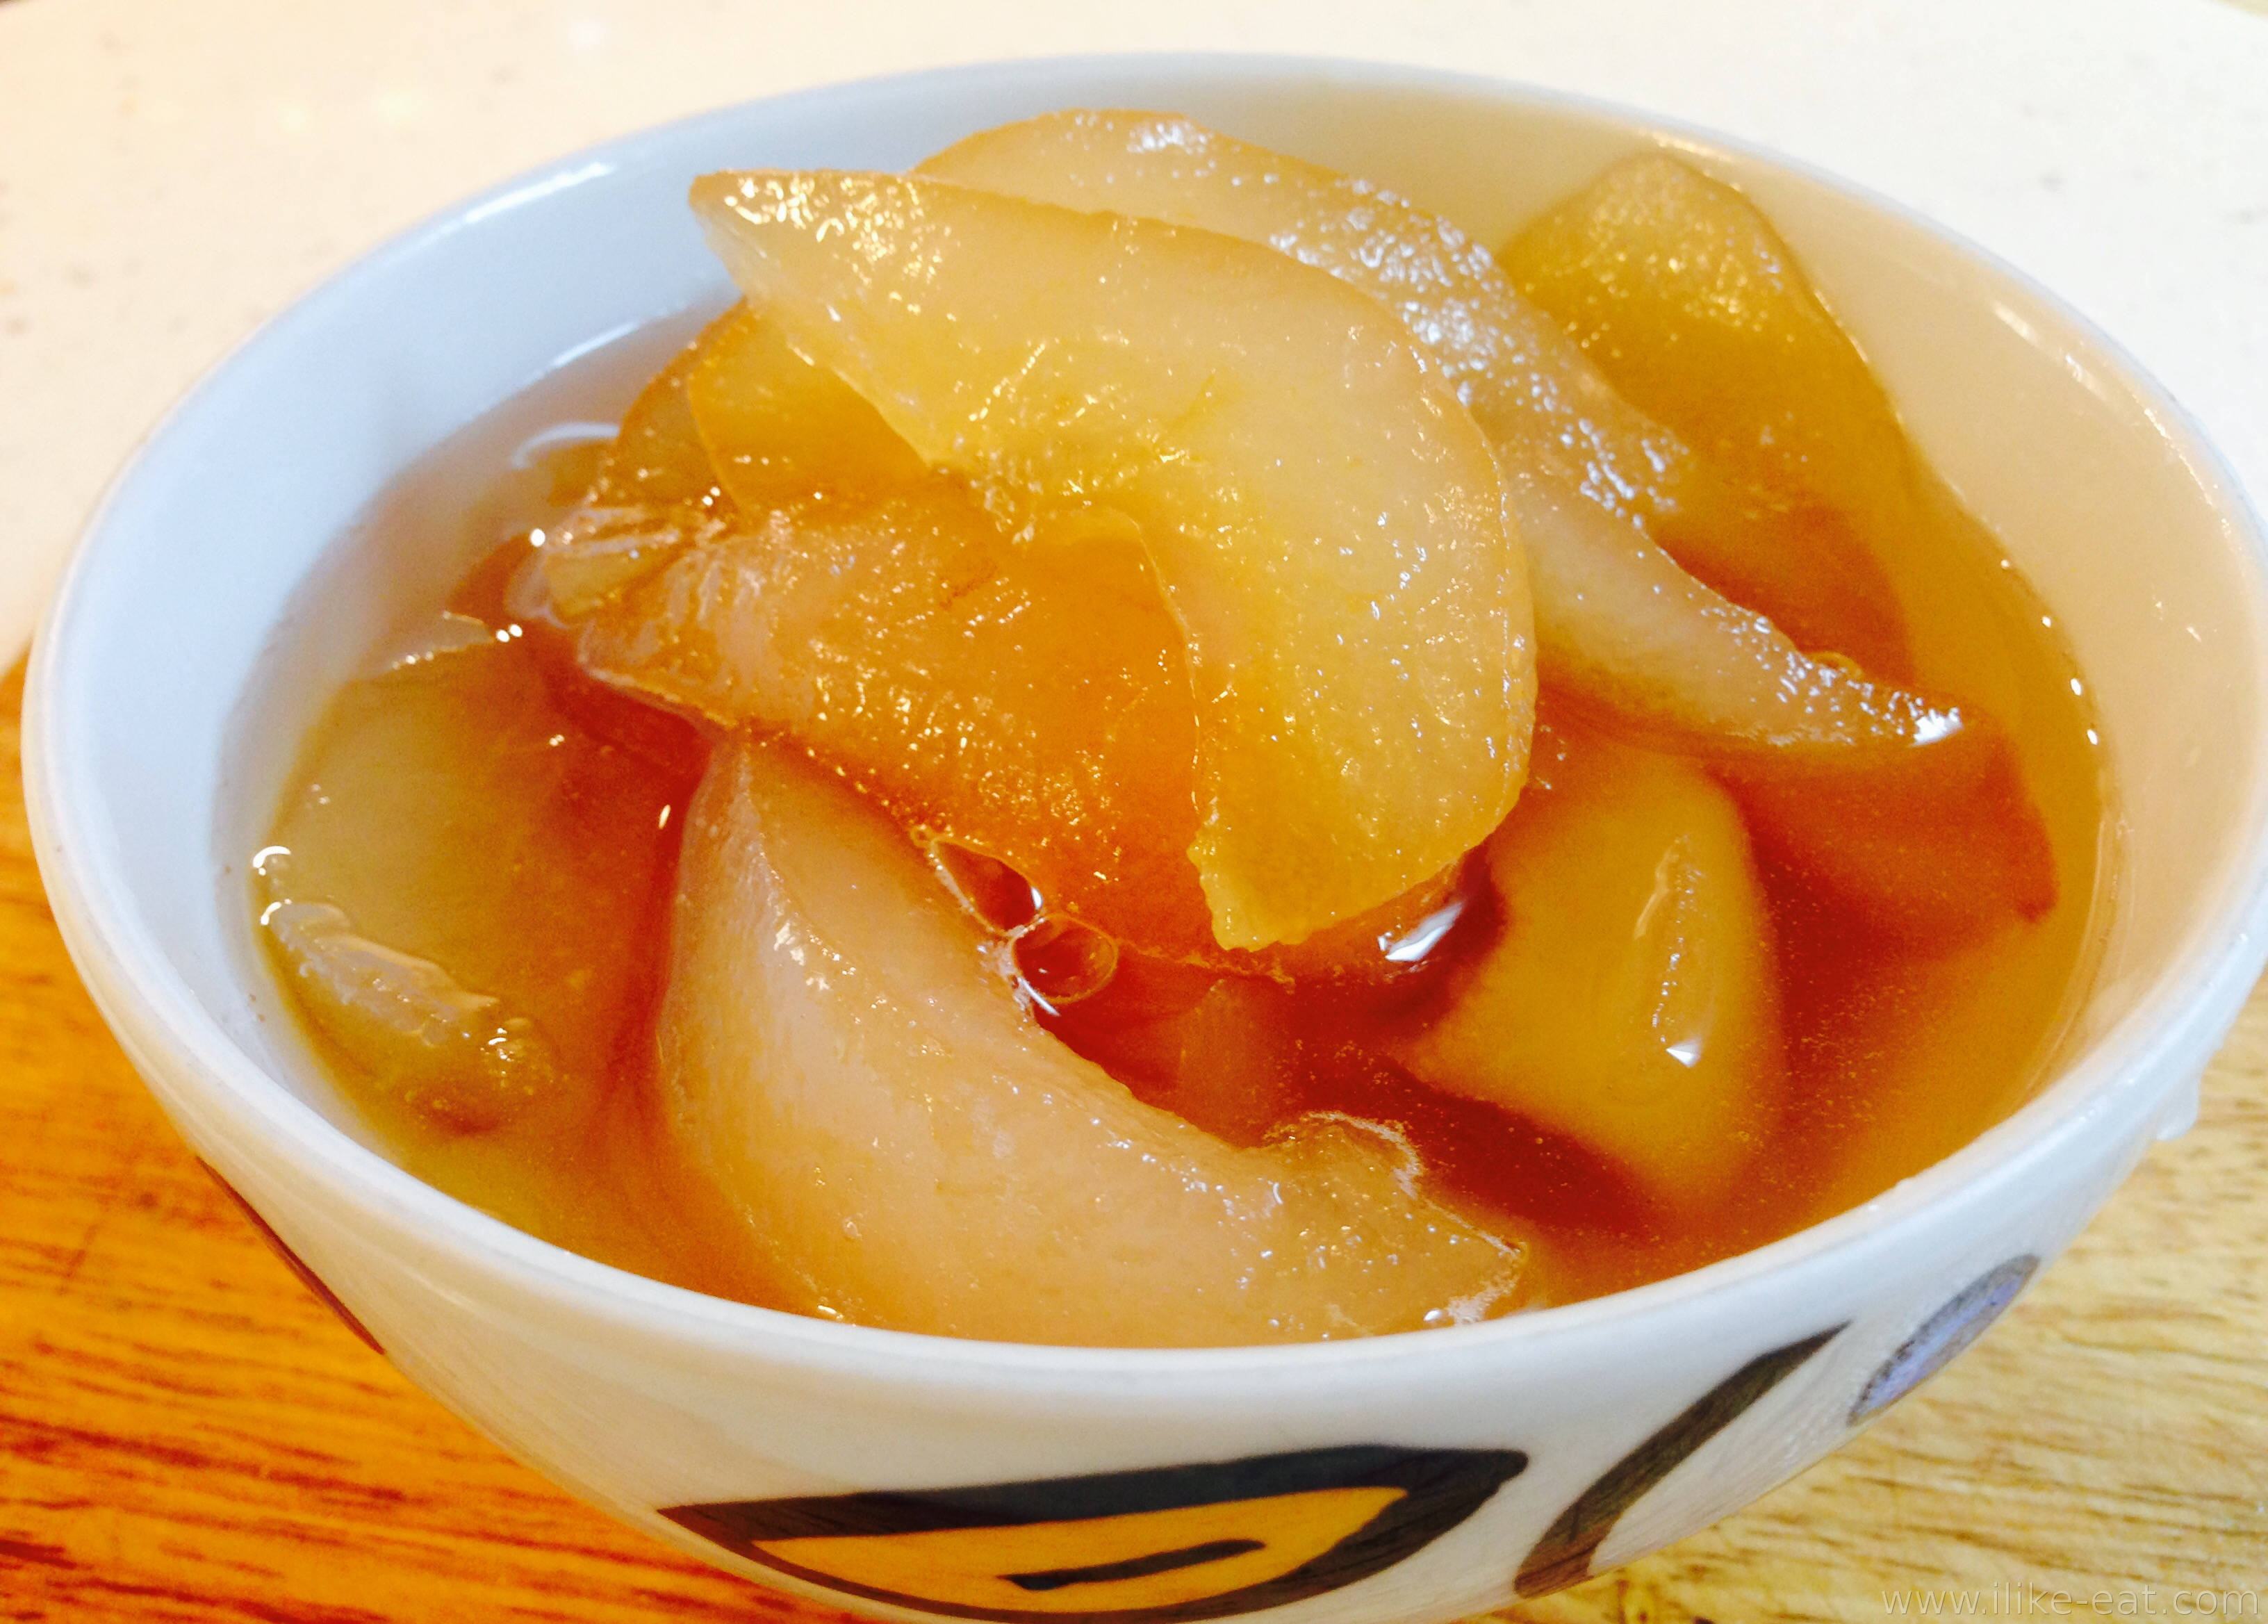 Грушевое варенье с апельсином рецепт пошагово